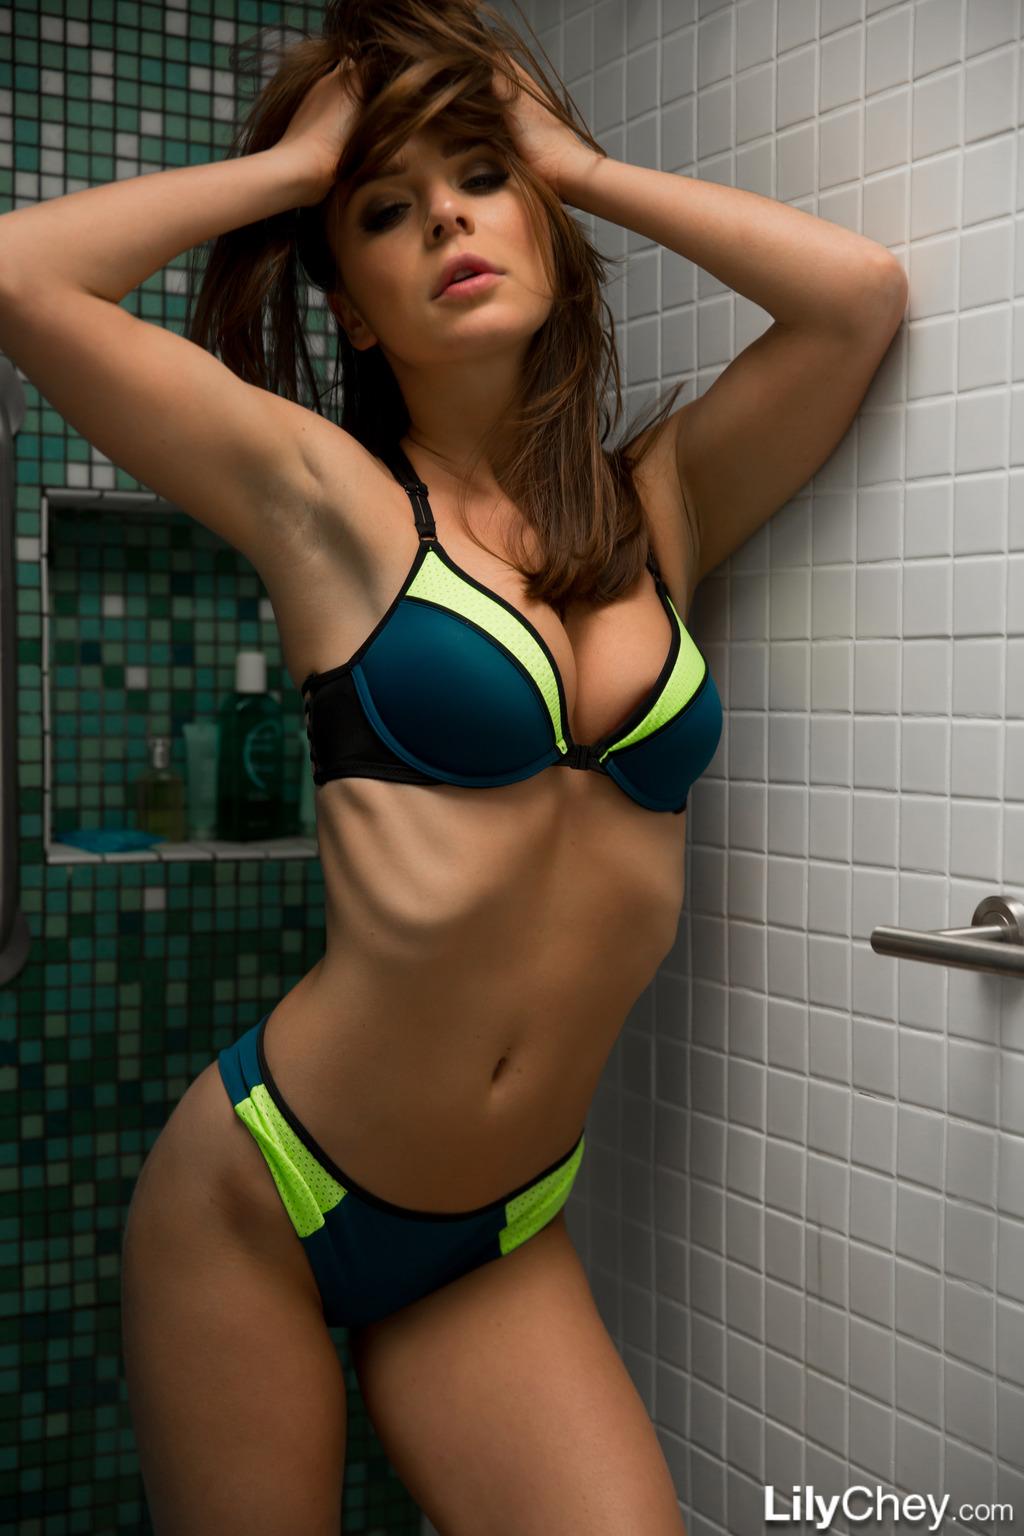 Lily Chey In Bikini Shower 11